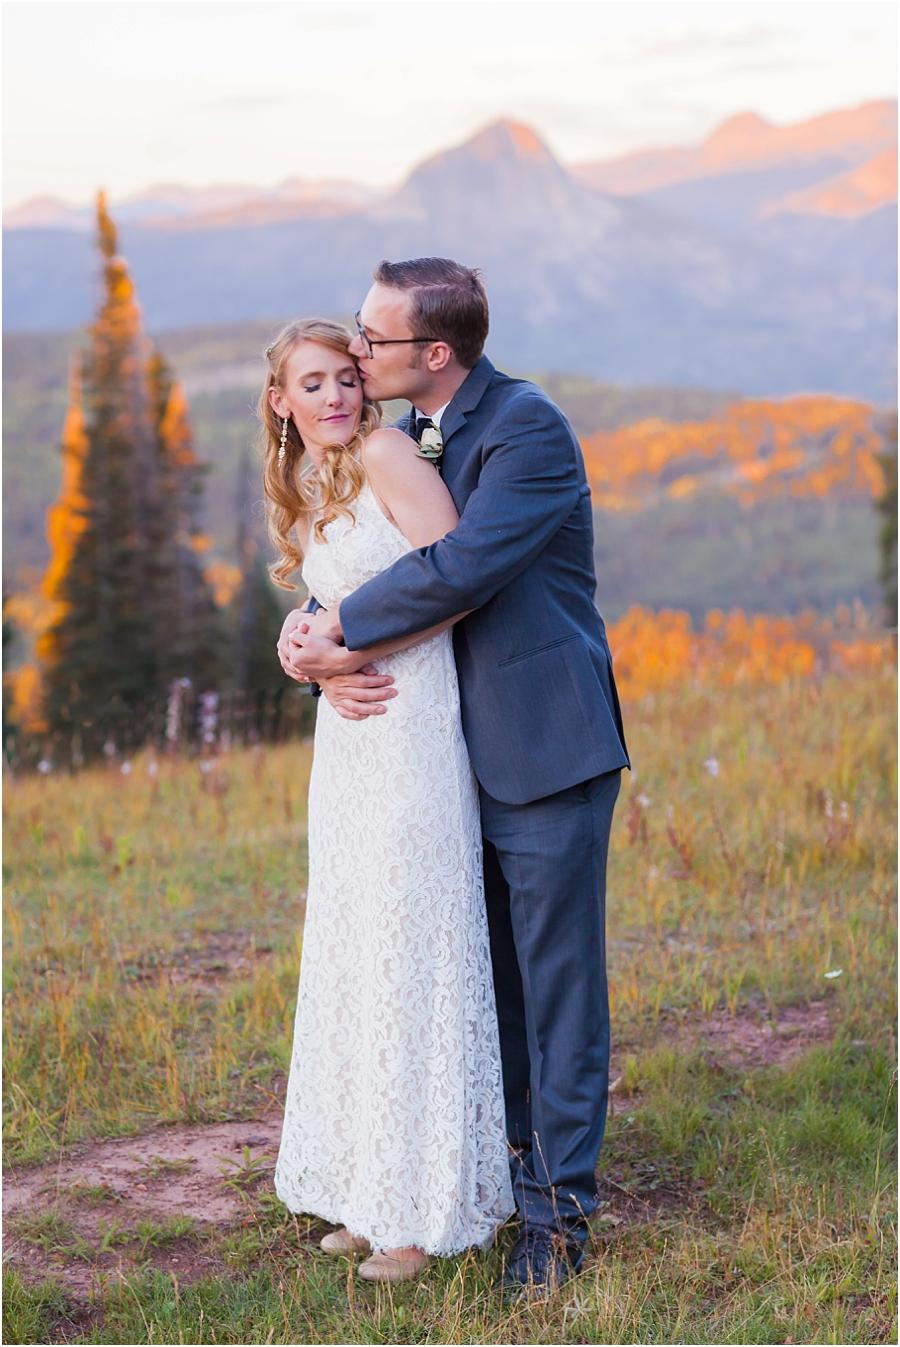 advenure-wedding-photographer-durango-colorado.jpg